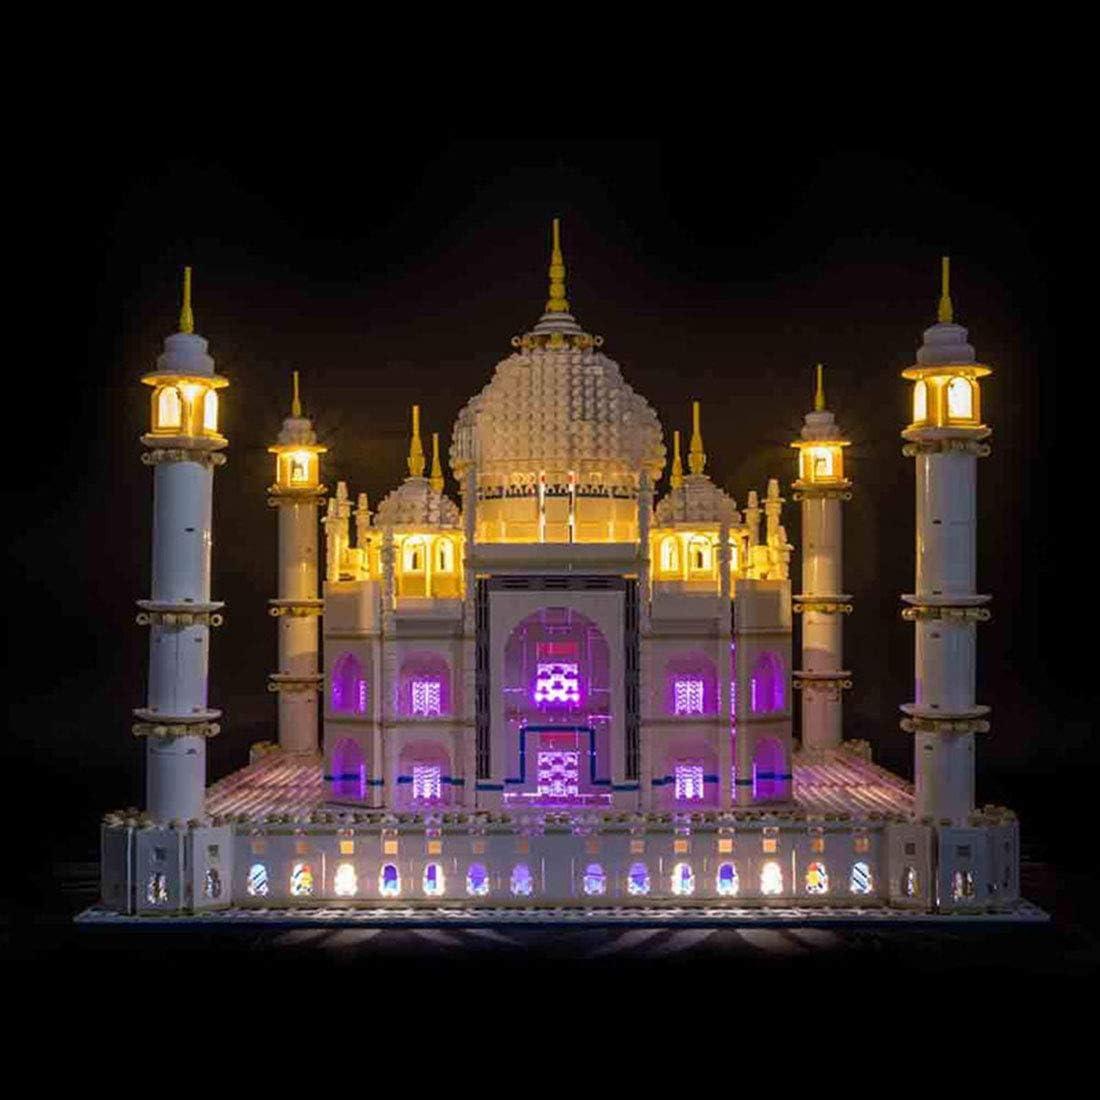 LIGHTAILING Light Set for Creator Expert Taj Mahal 10256 Building Blocks Model - Led Light kit Compatible with Lego 10256 NOT Included The Model